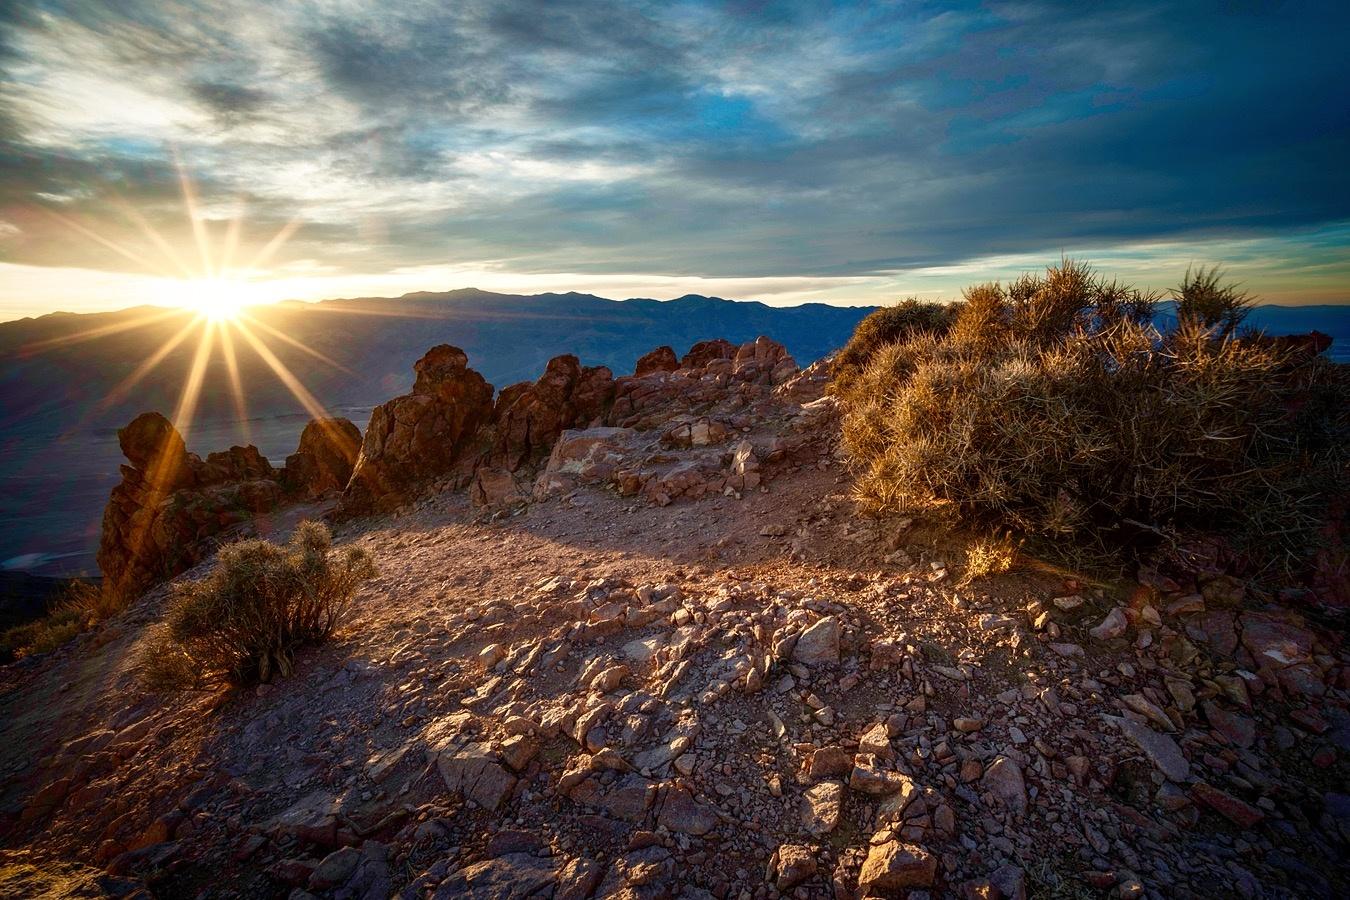 Dante's Peak Sunburst by Daniel Wishard